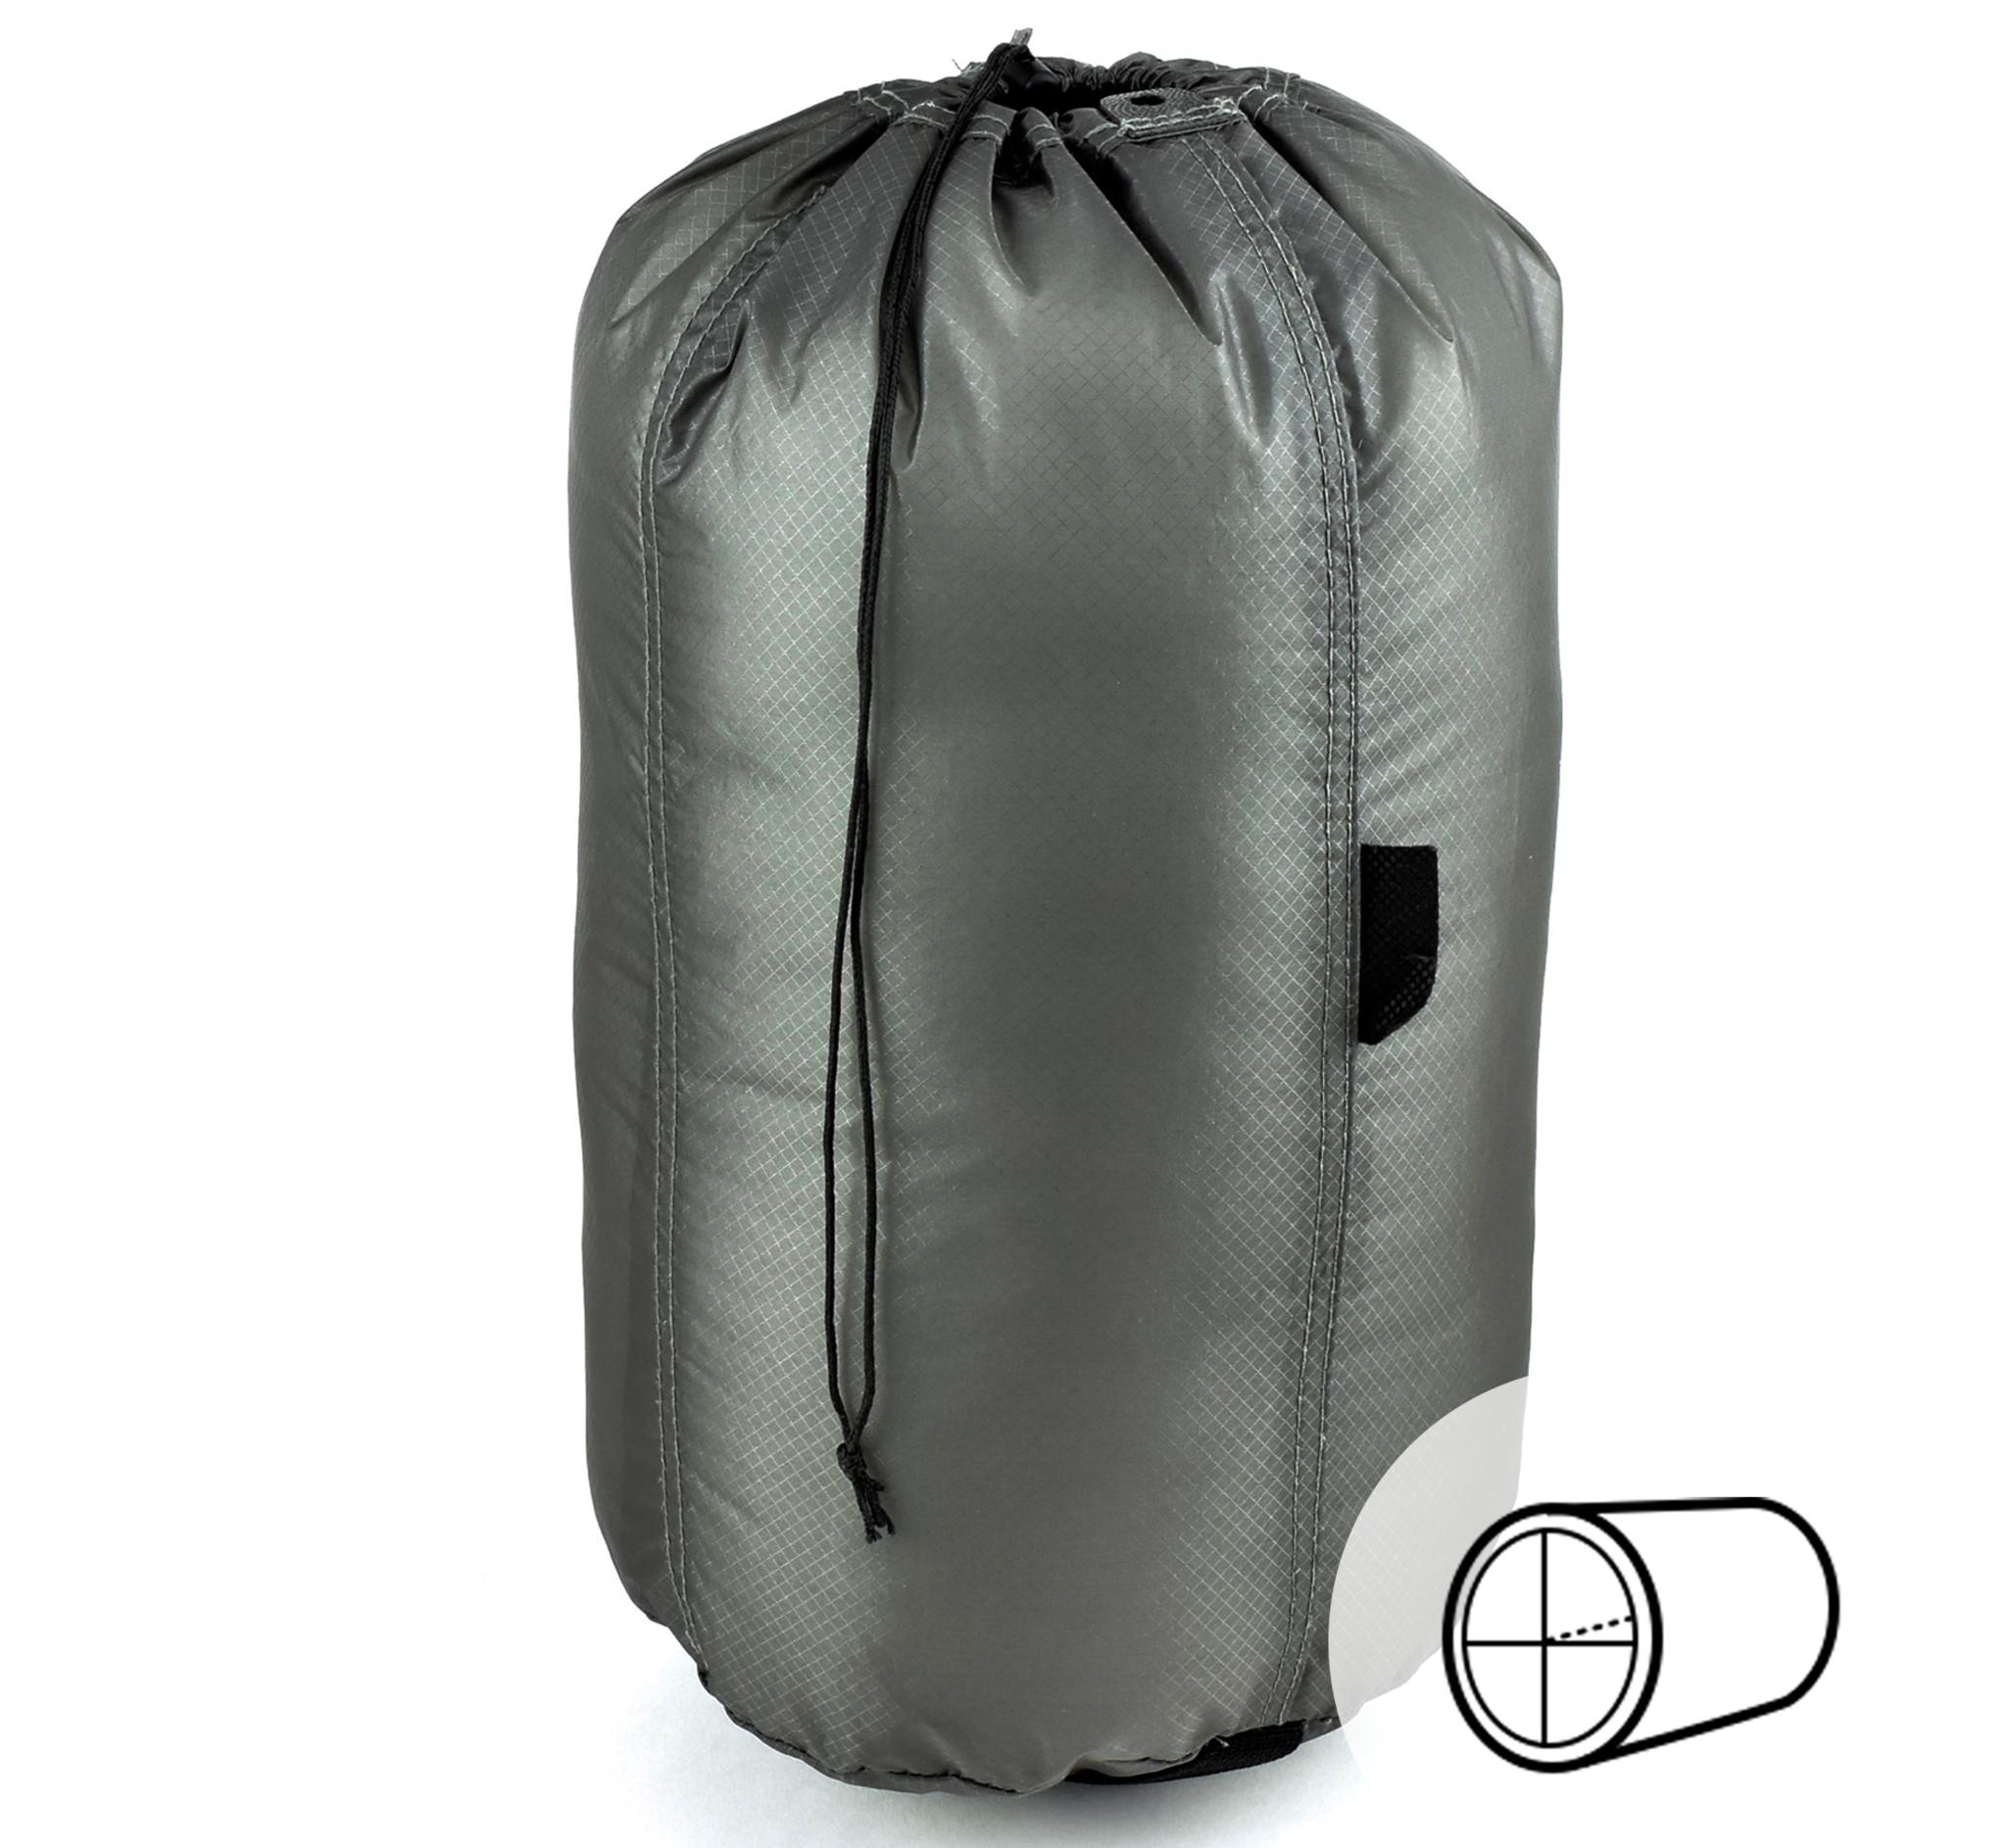 photo of a Gobi Gear stuff sack